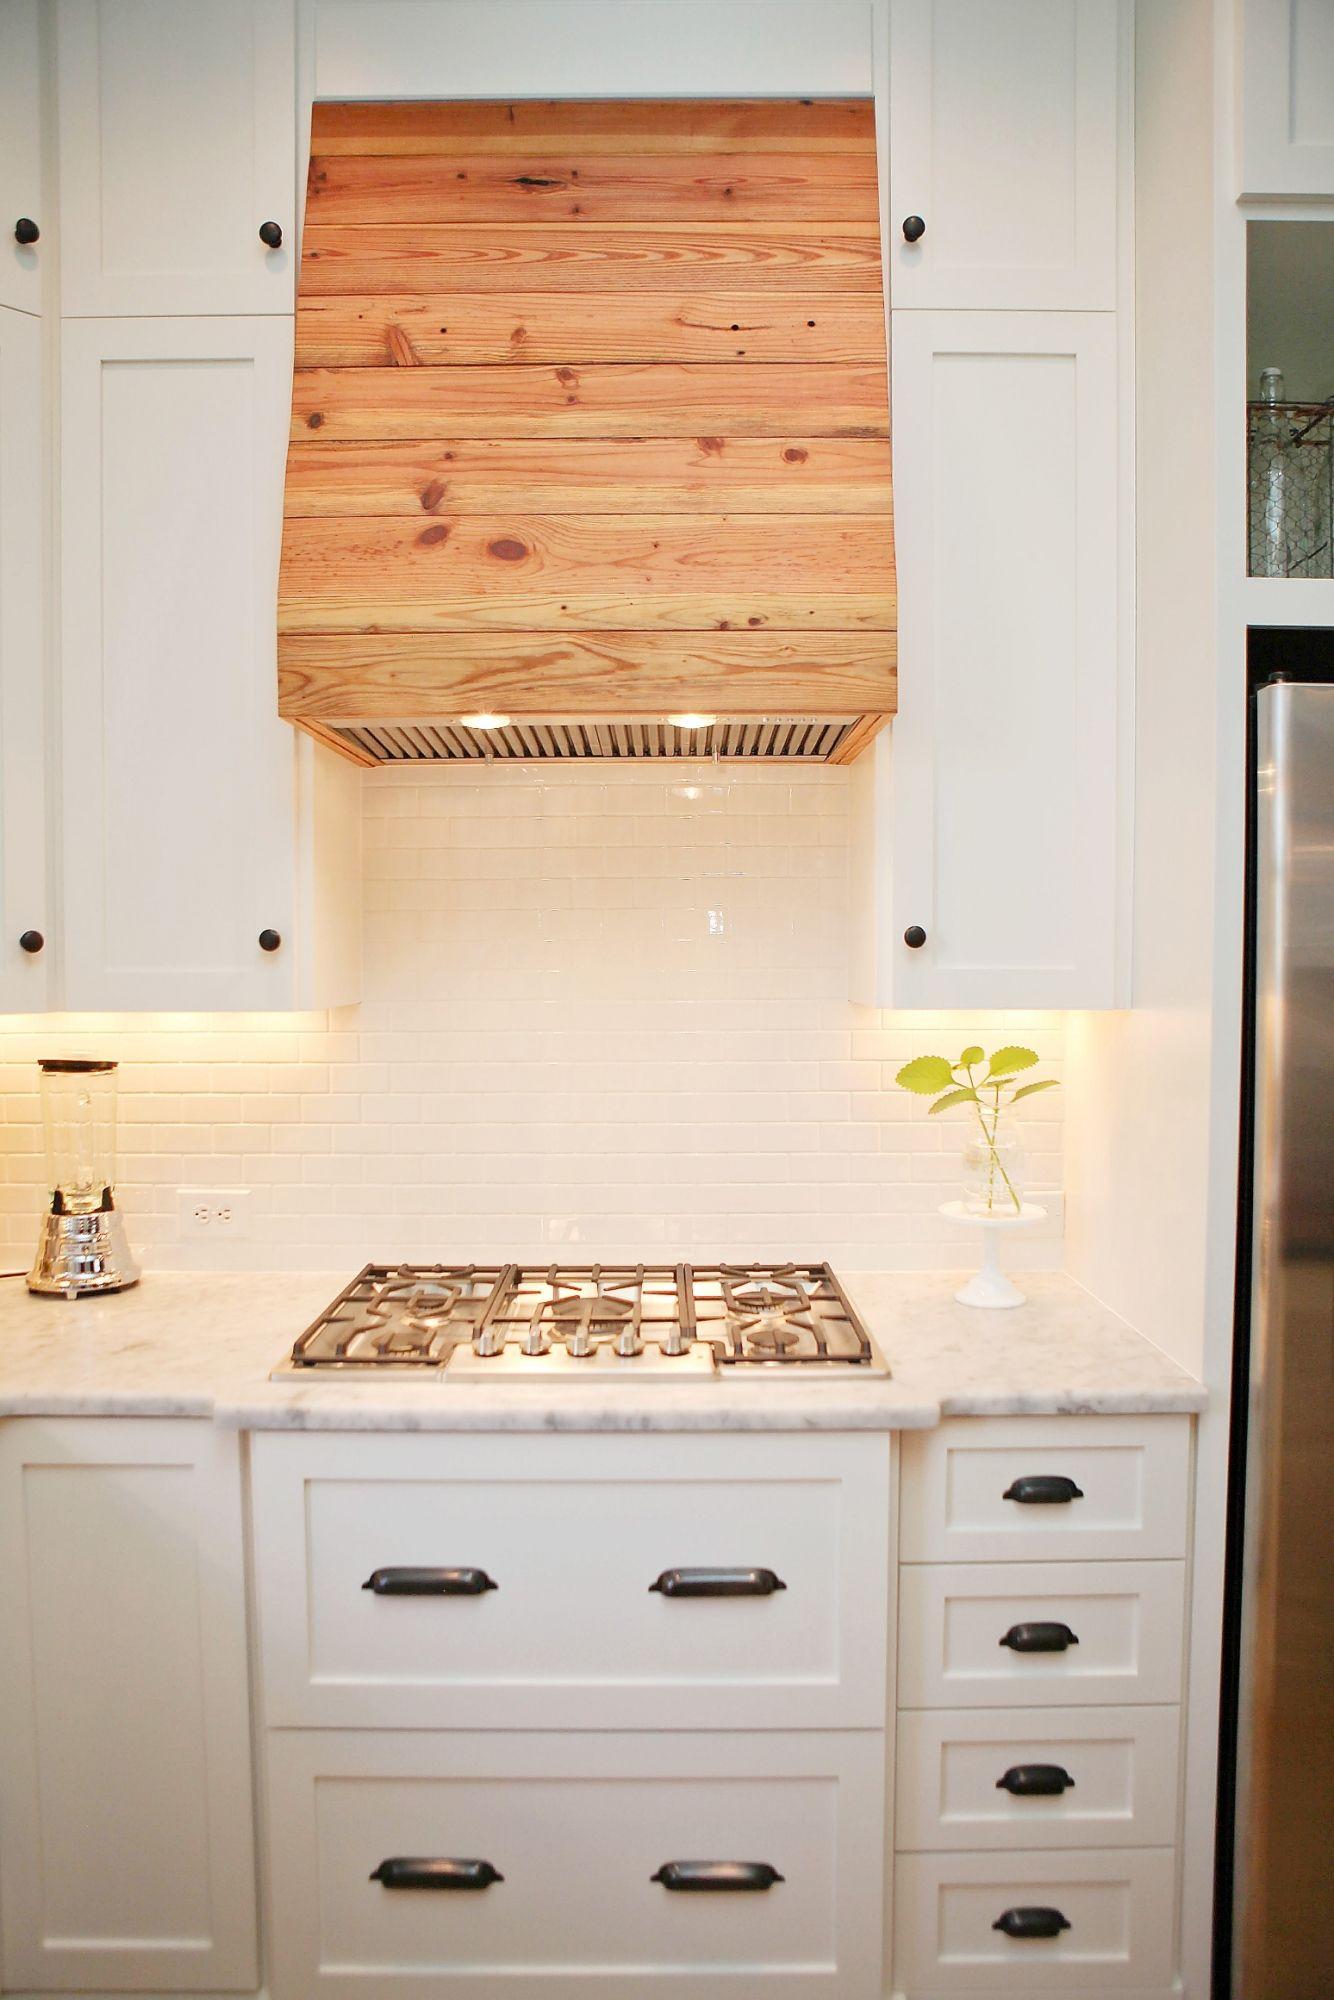 Storage Smart Cottage Kitchen Unique Cooktop Hood Made